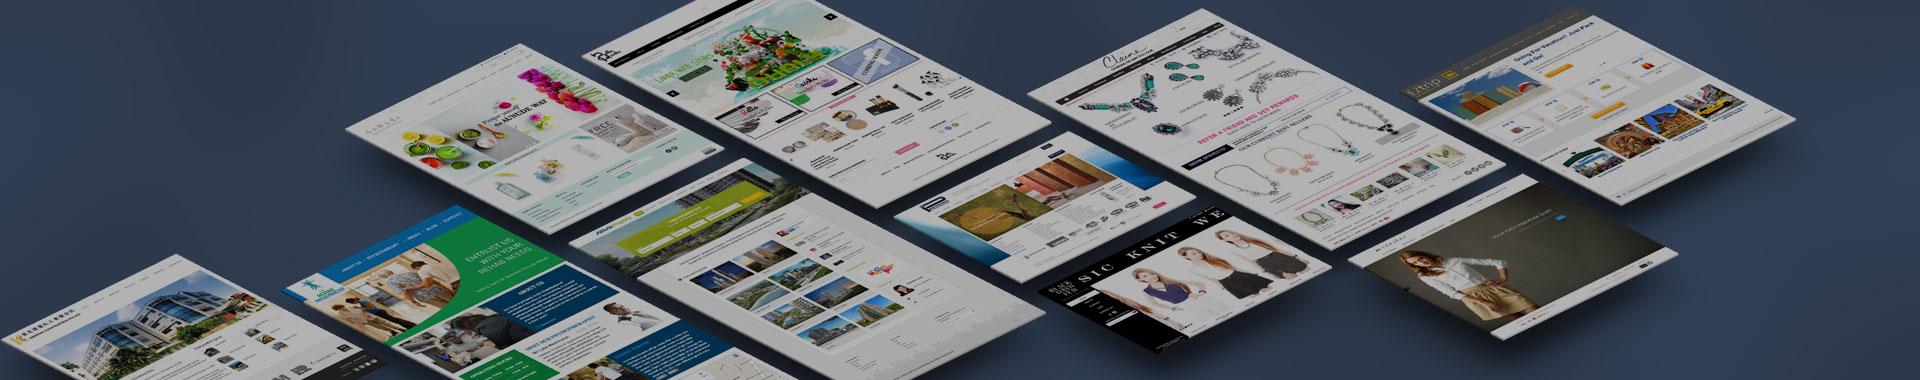 Website Design Singapore - I Want It